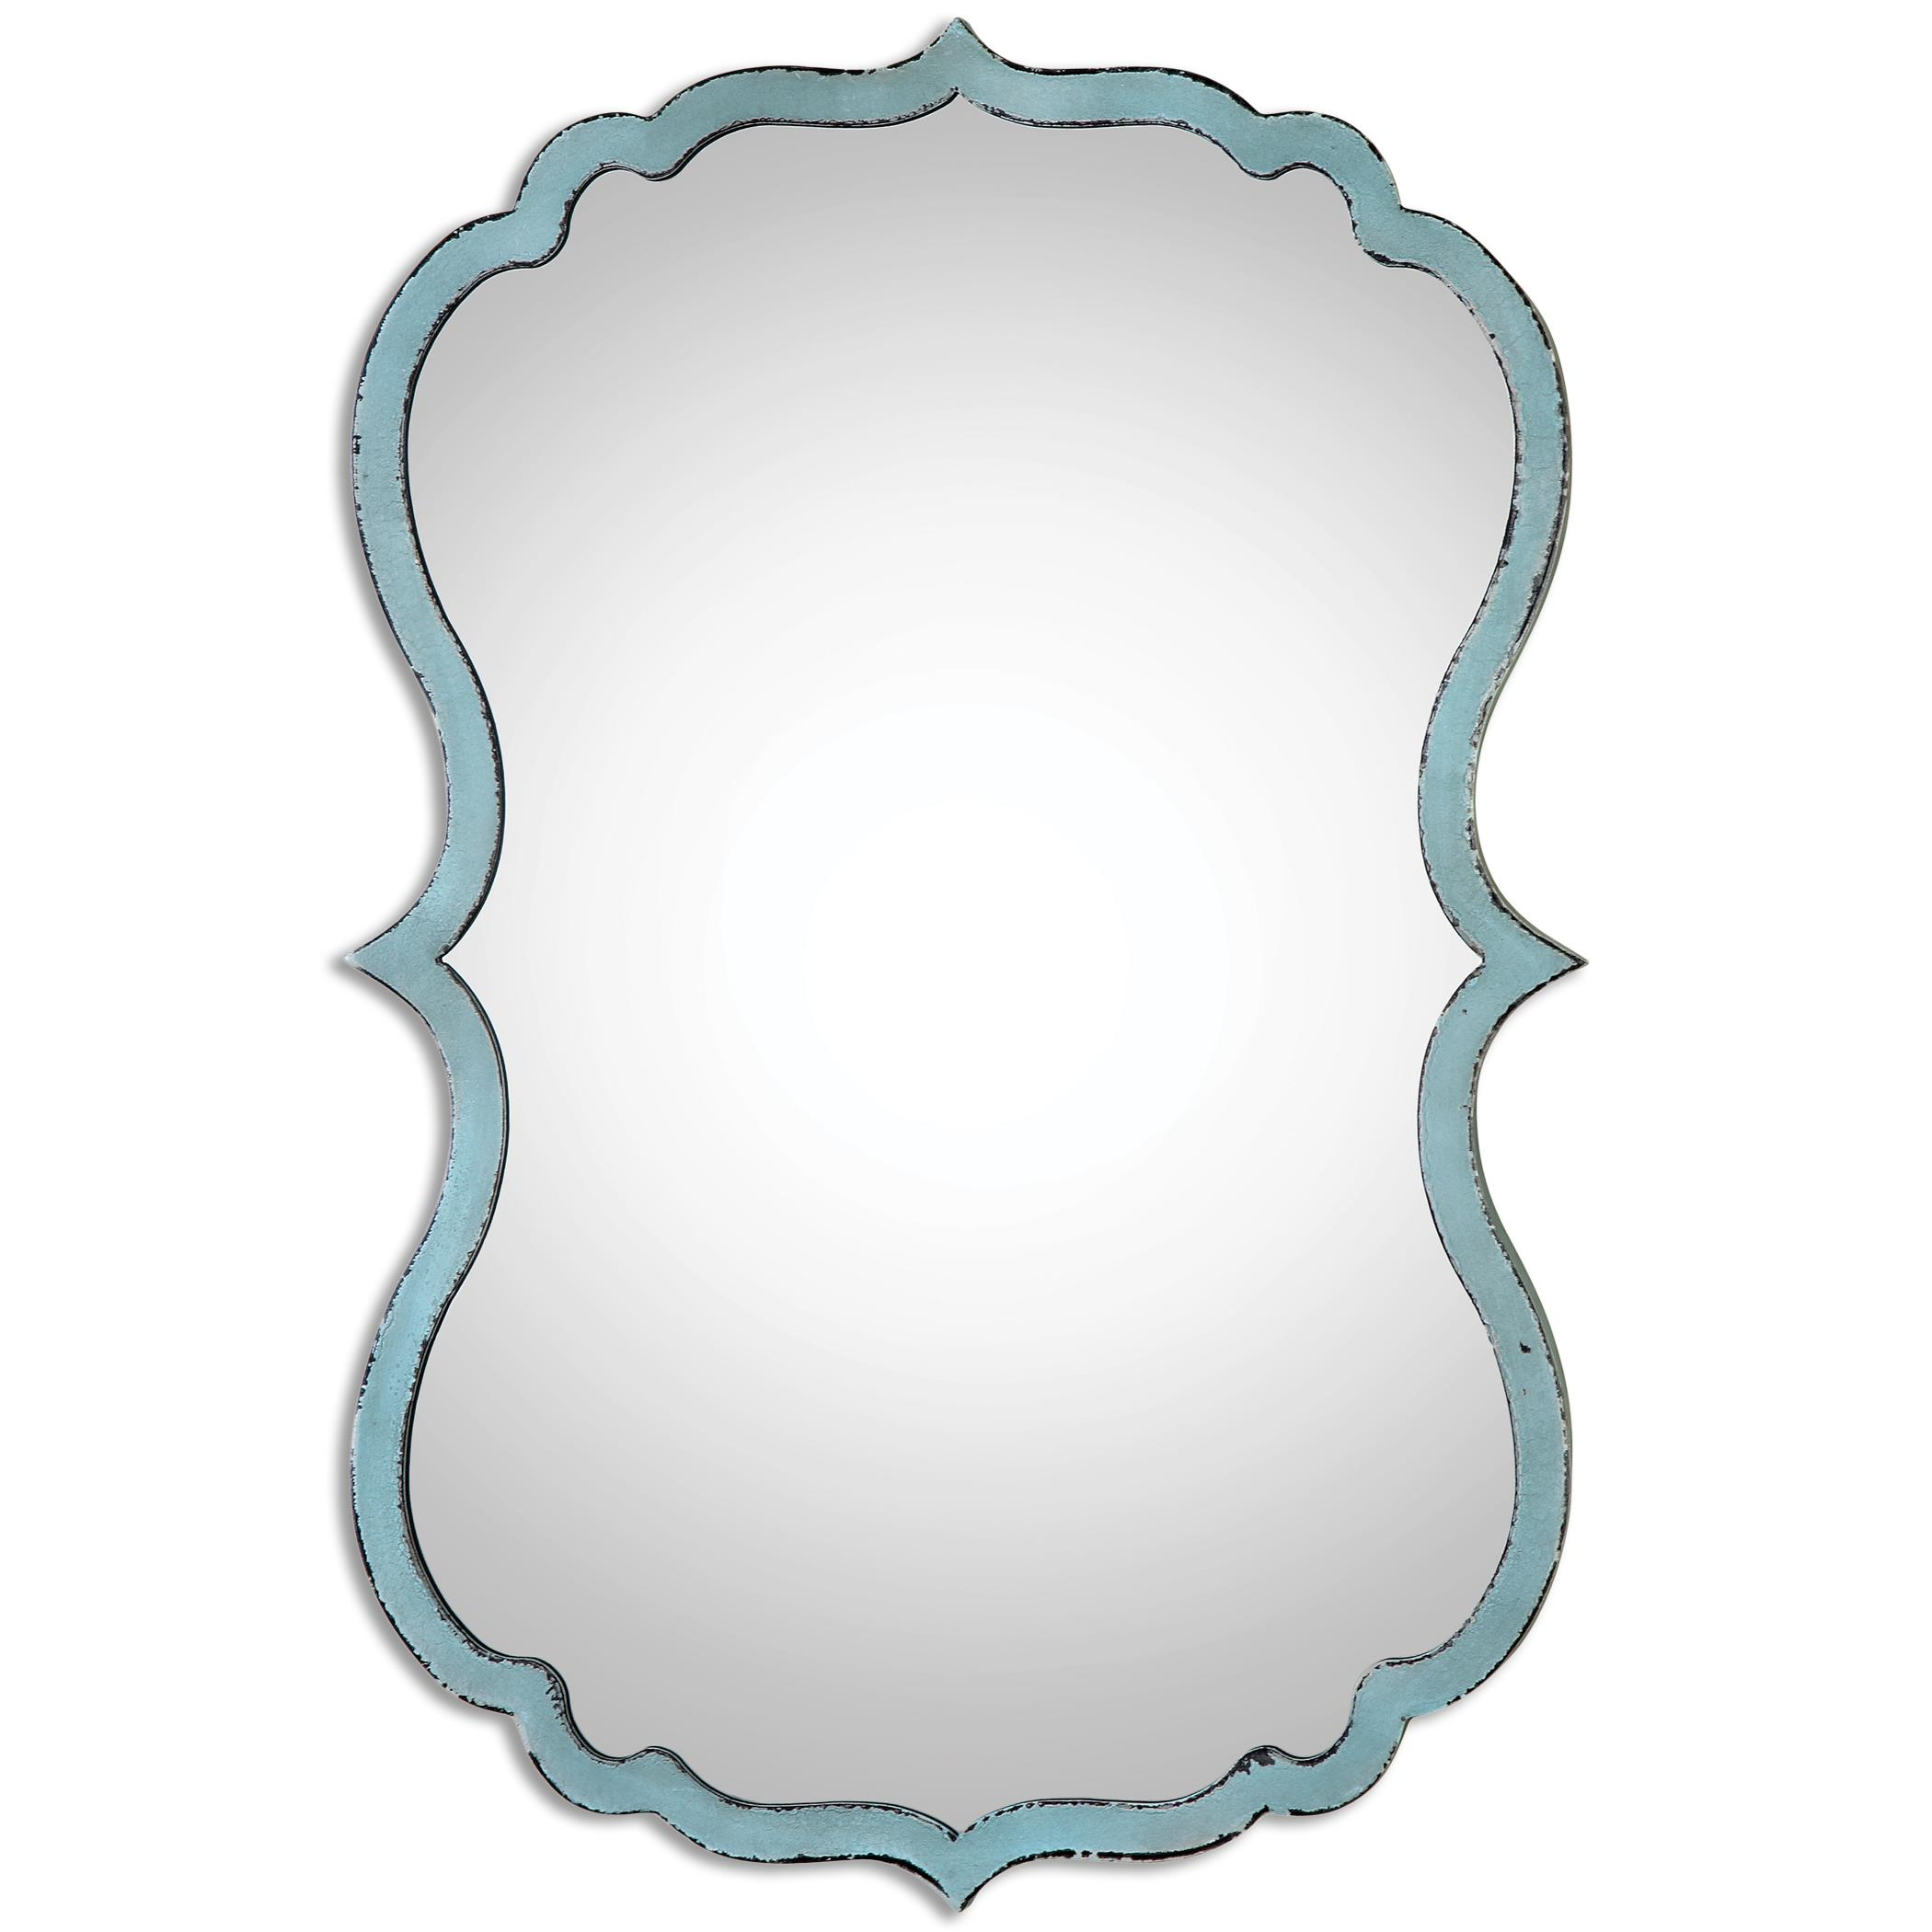 Uttermost Mirrors Nicola Light Blue Mirror - Item Number: 13925